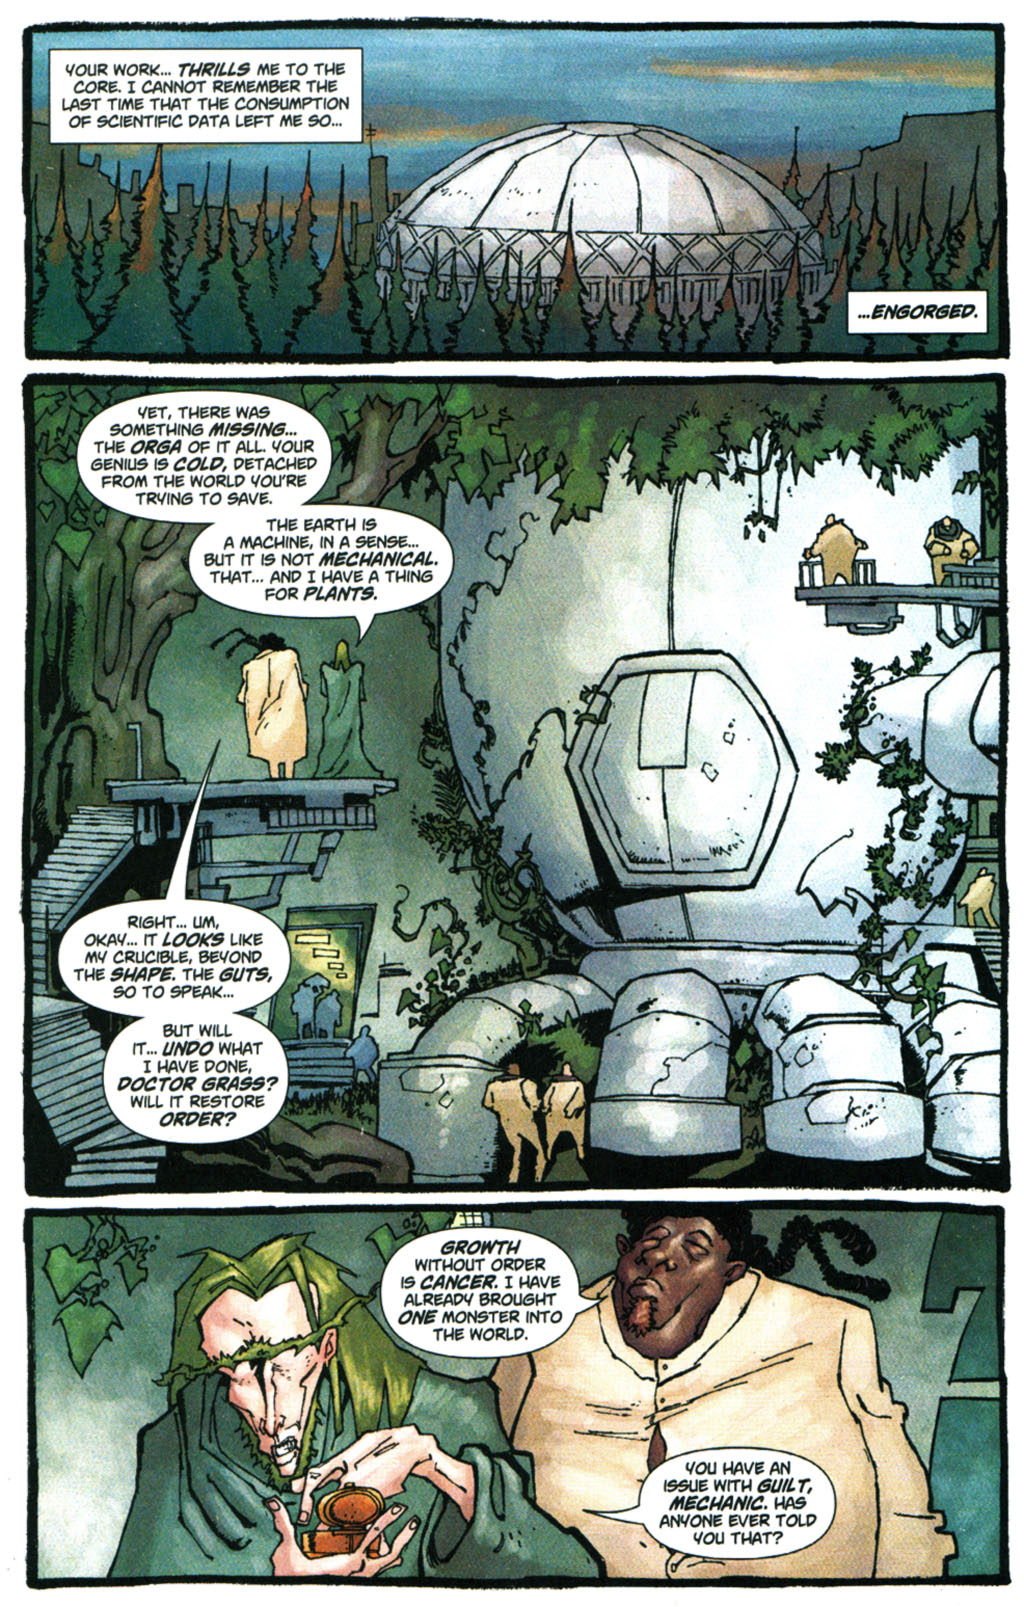 Read online Enginehead comic -  Issue #5 - 13